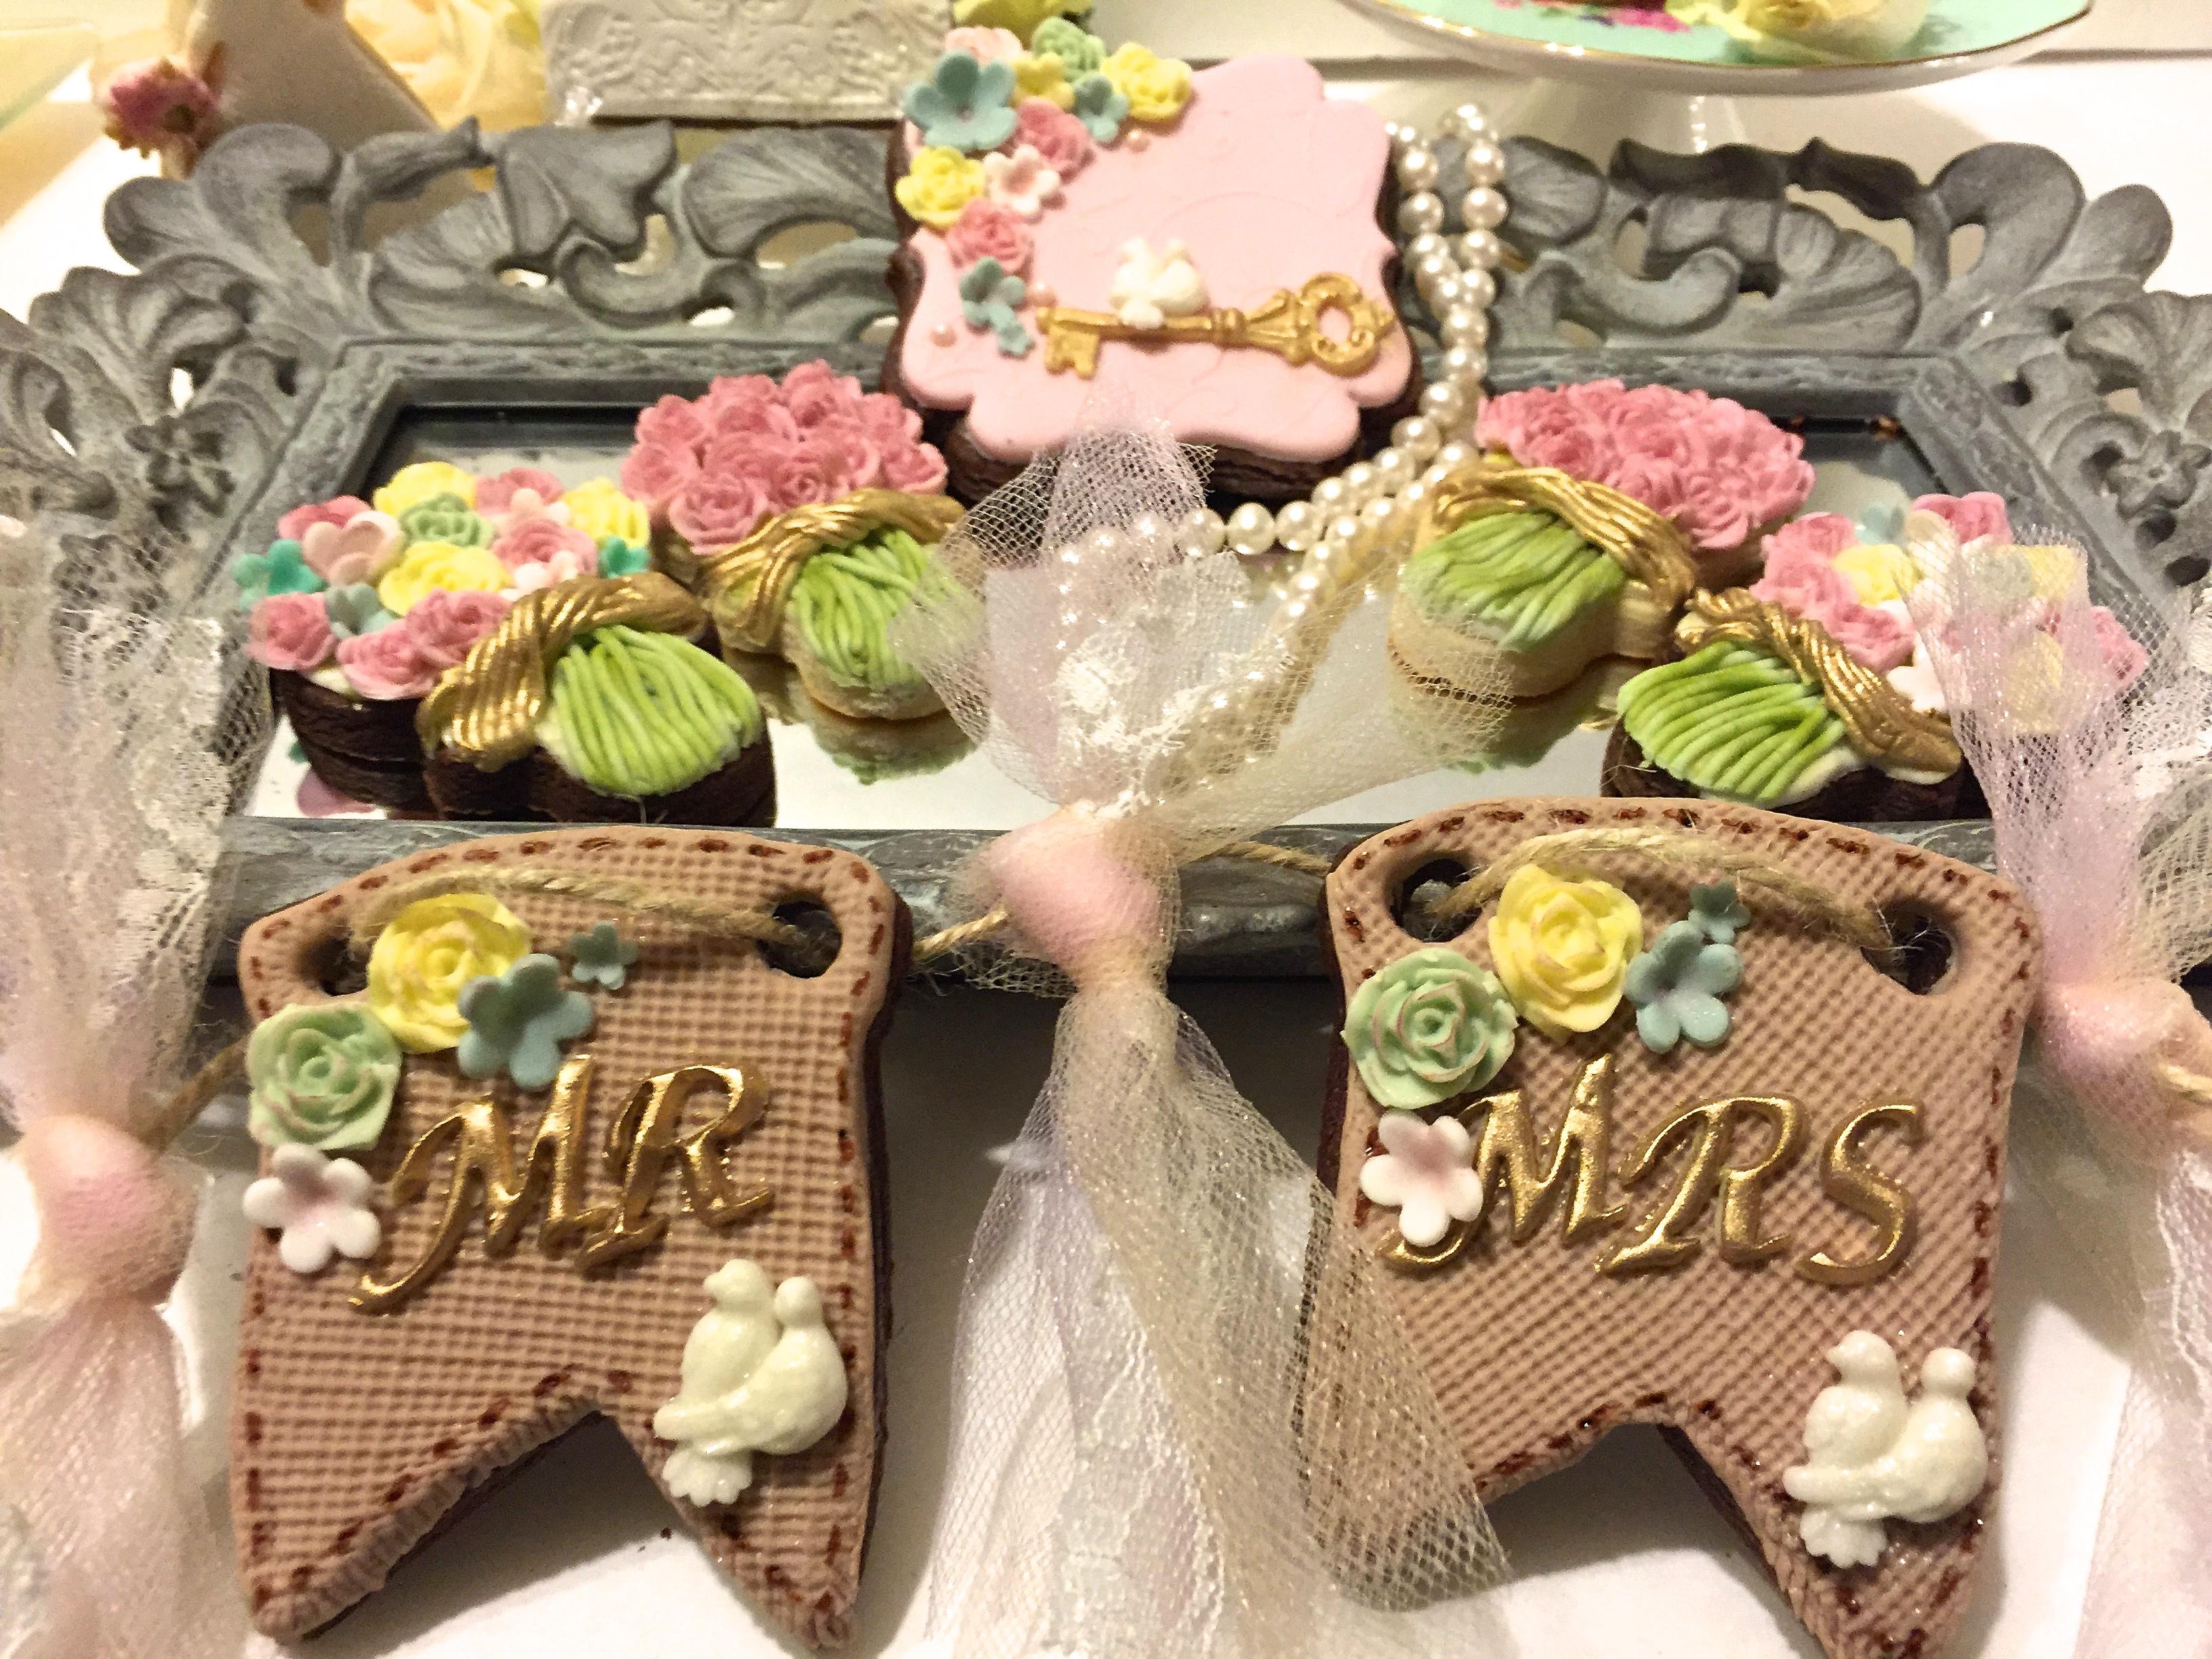 Mr & Mrs. burlap pennant cookies